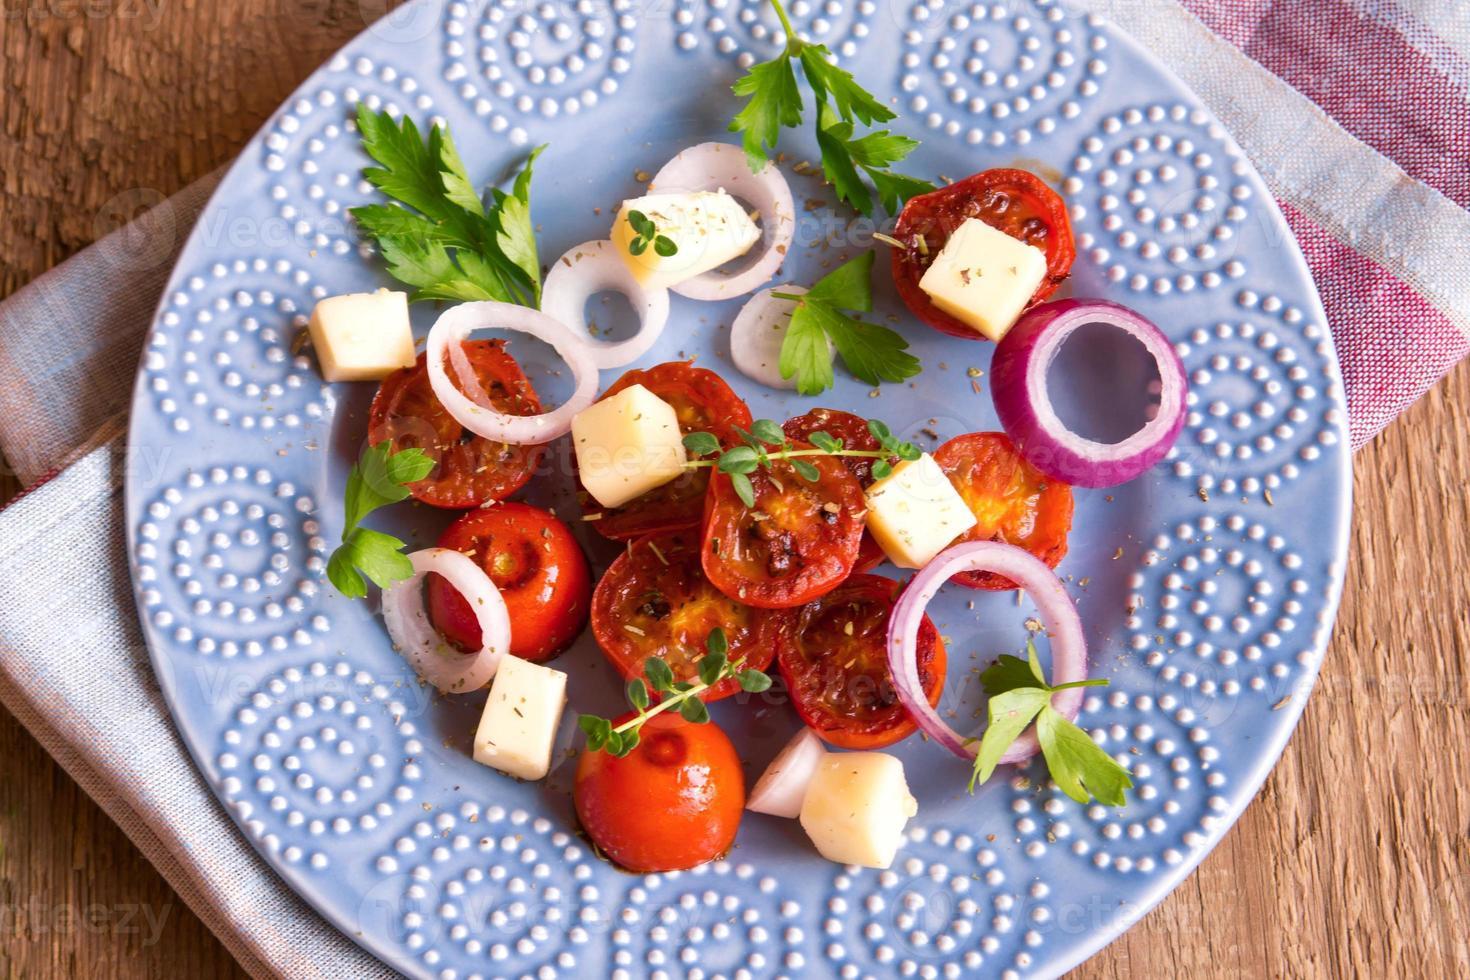 grillade tomater, ostsallad foto